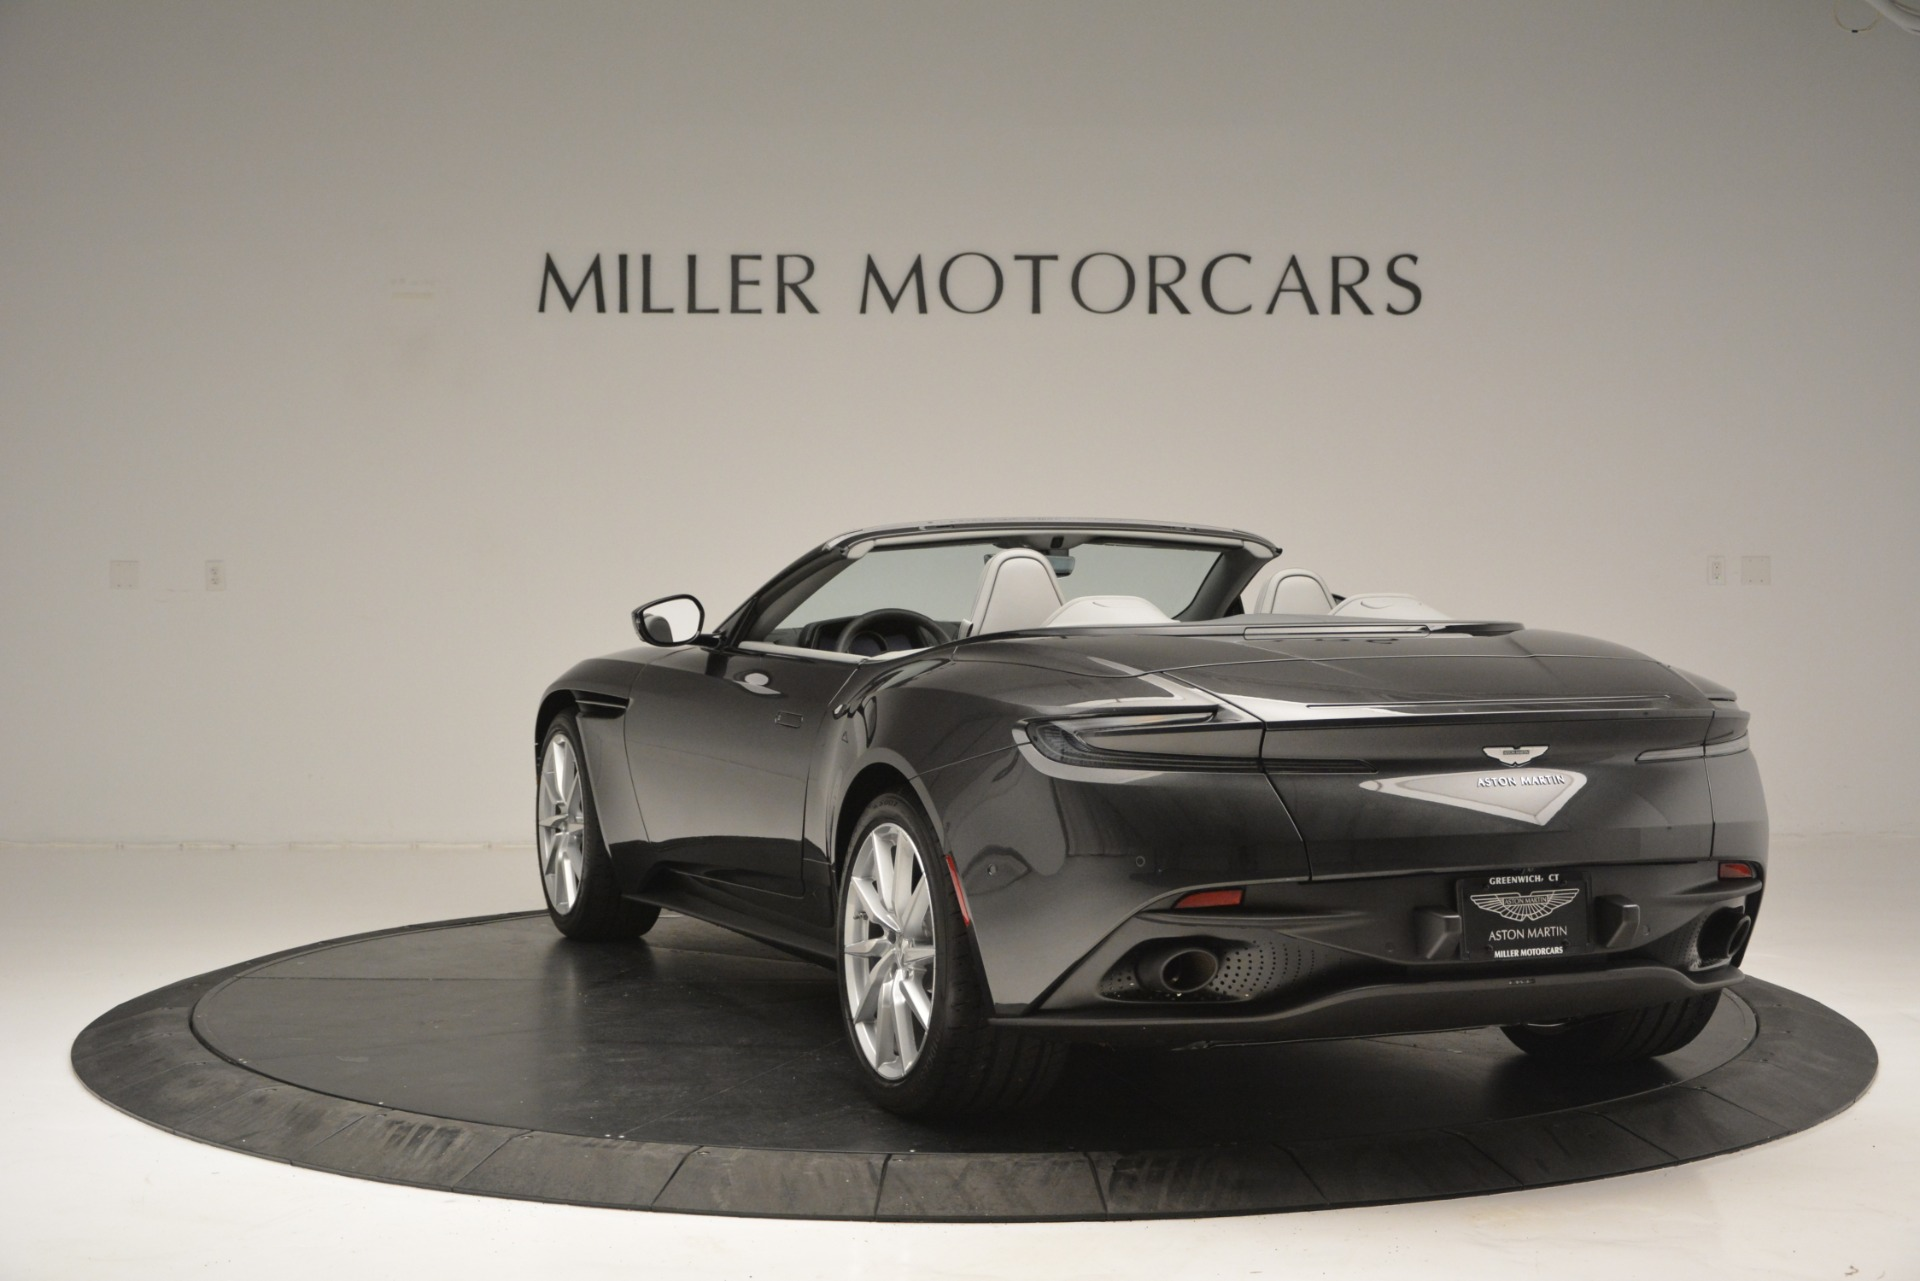 New 2019 Aston Martin DB11 V8 Convertible For Sale In Greenwich, CT. Alfa Romeo of Greenwich, A1329 2902_p5